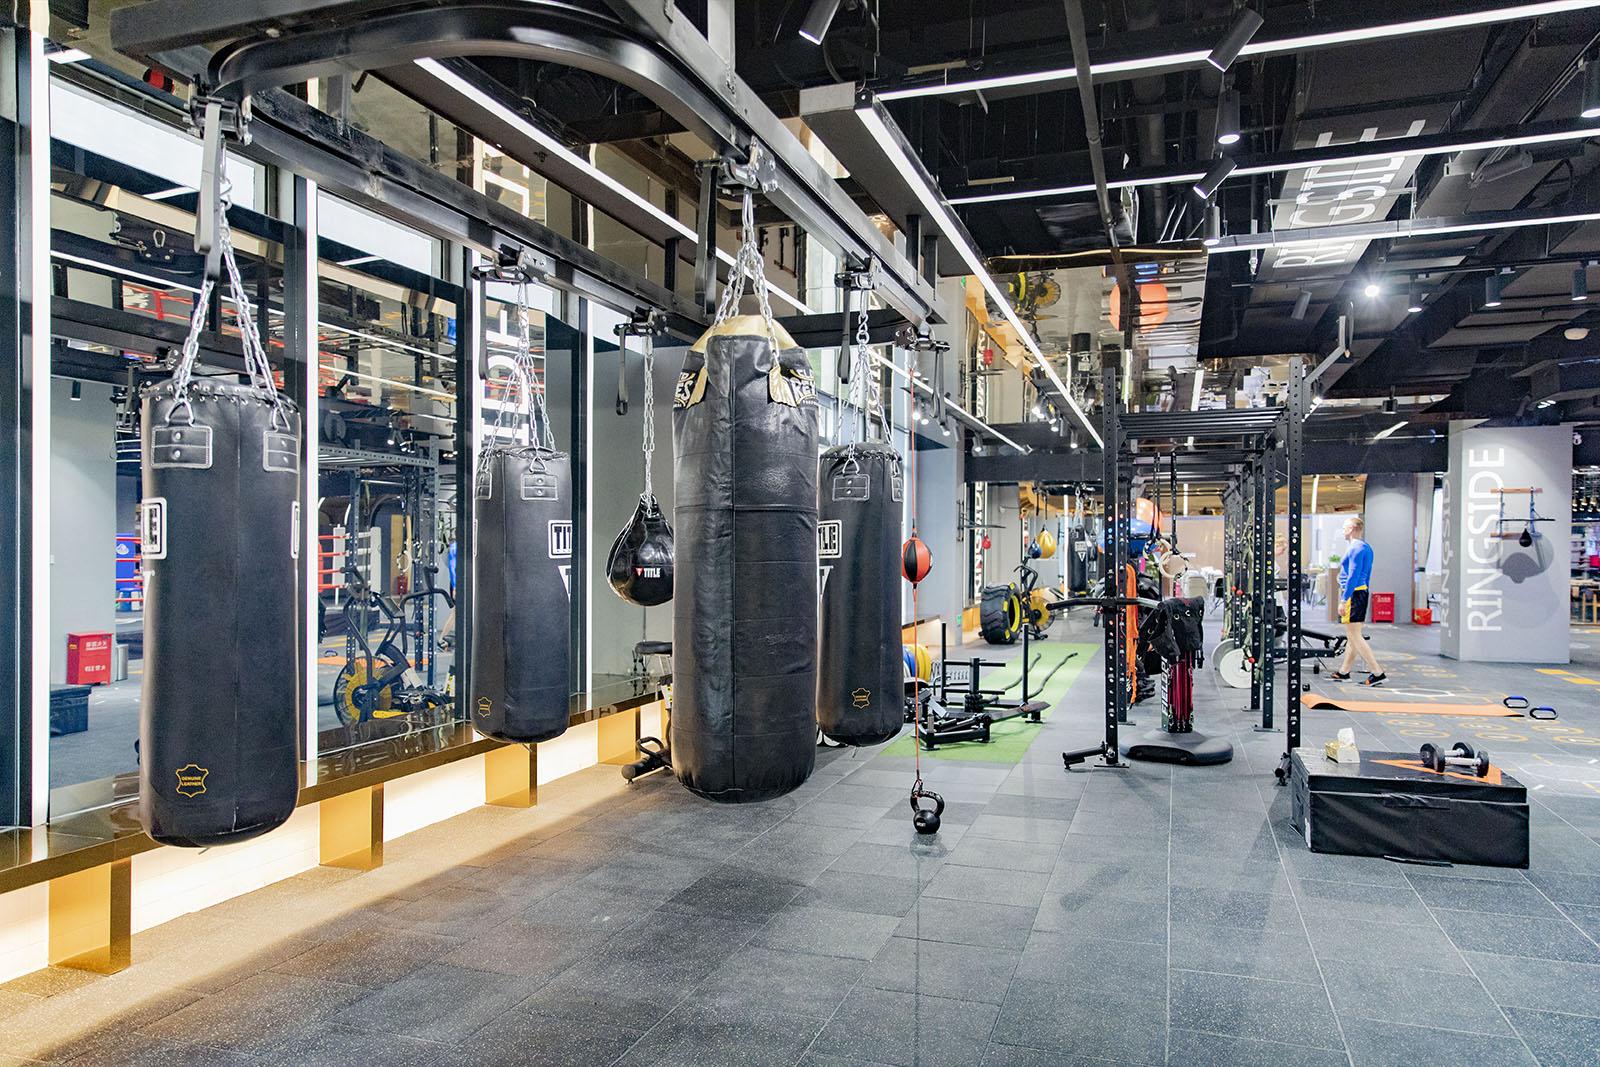 Ringside Boxing & Beyond (Nanjing Xi Lu) Shanghai